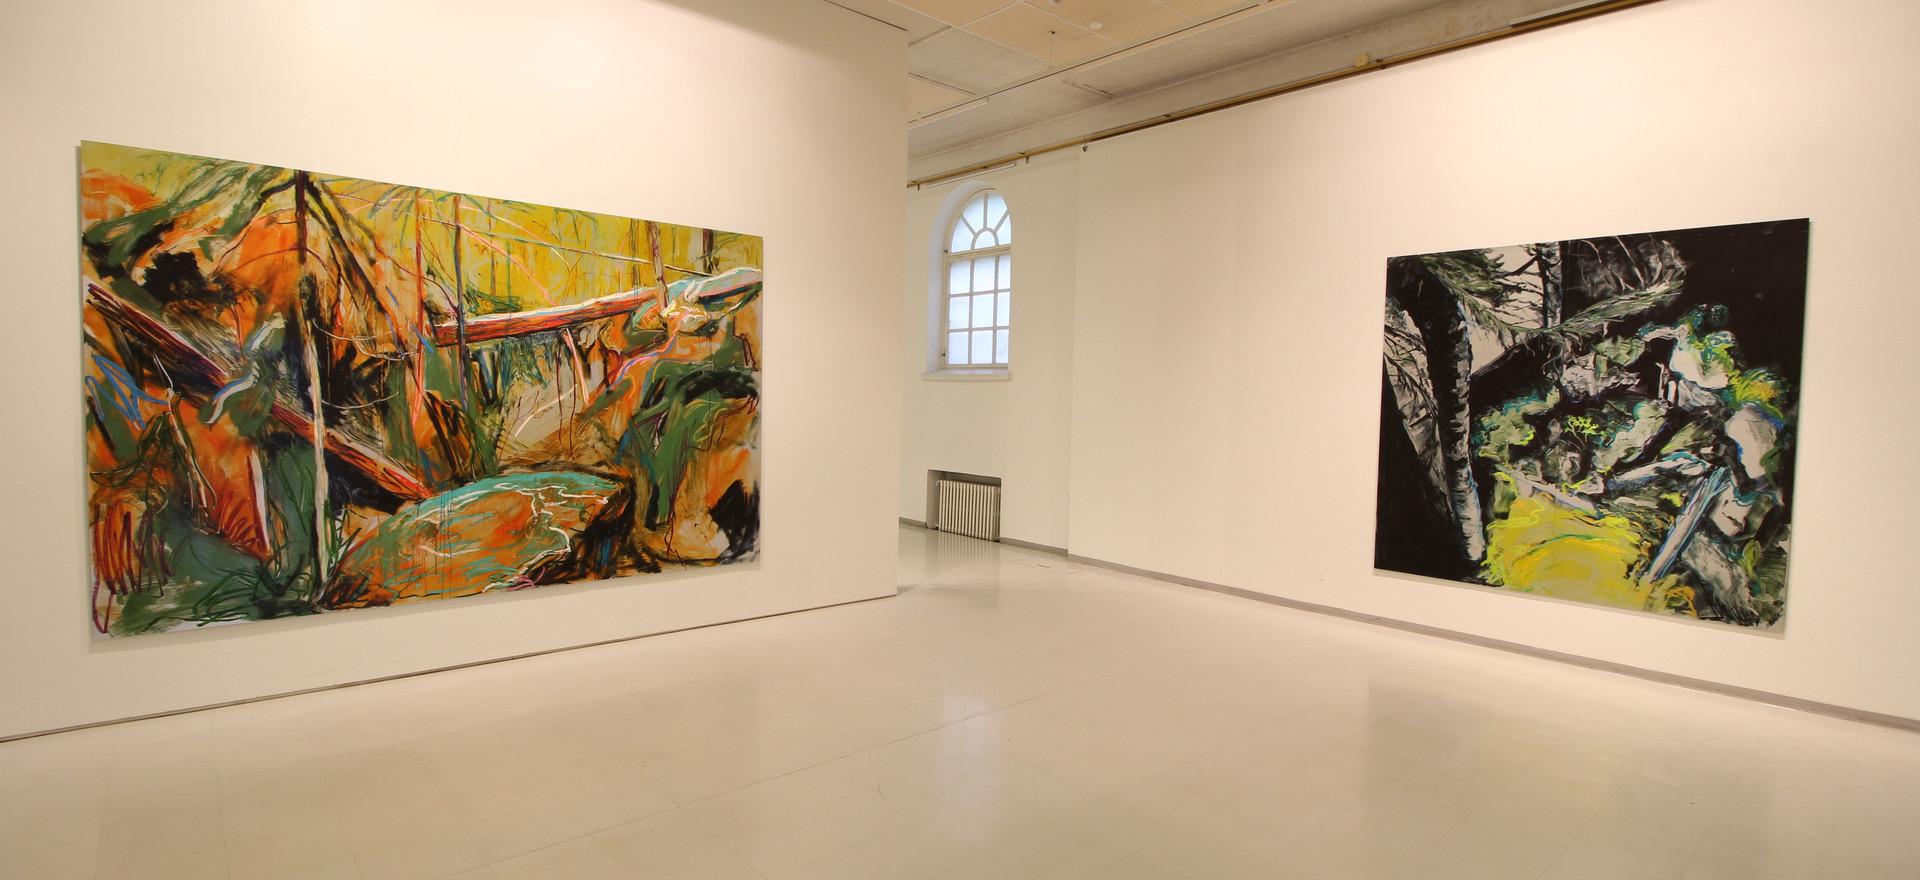 Mältinranta Art Center, Gallery 4